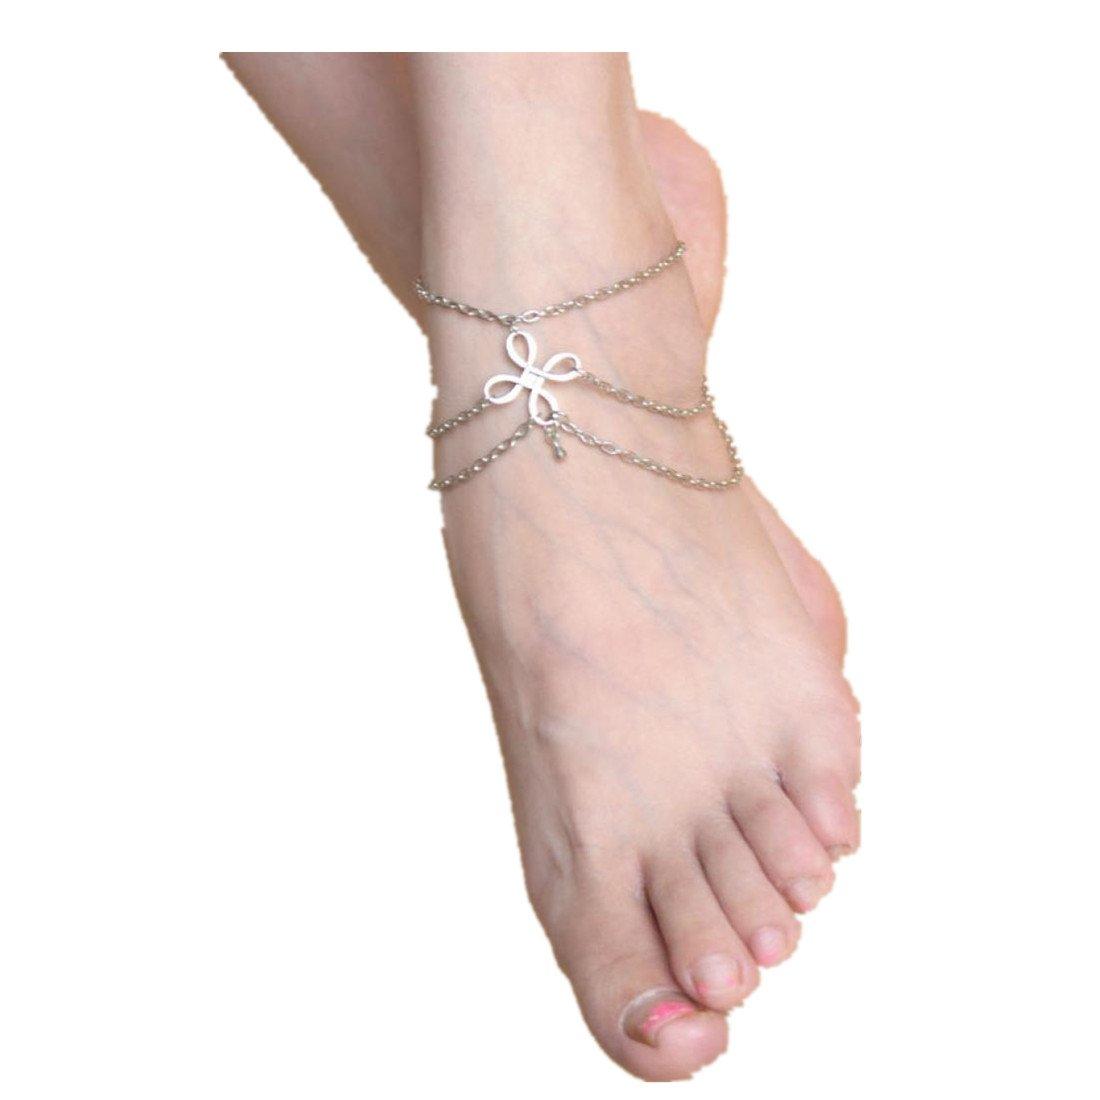 Kingfansion Women Beach Barefoot Sandal Foot Tassel Jewelry Anklet Chain